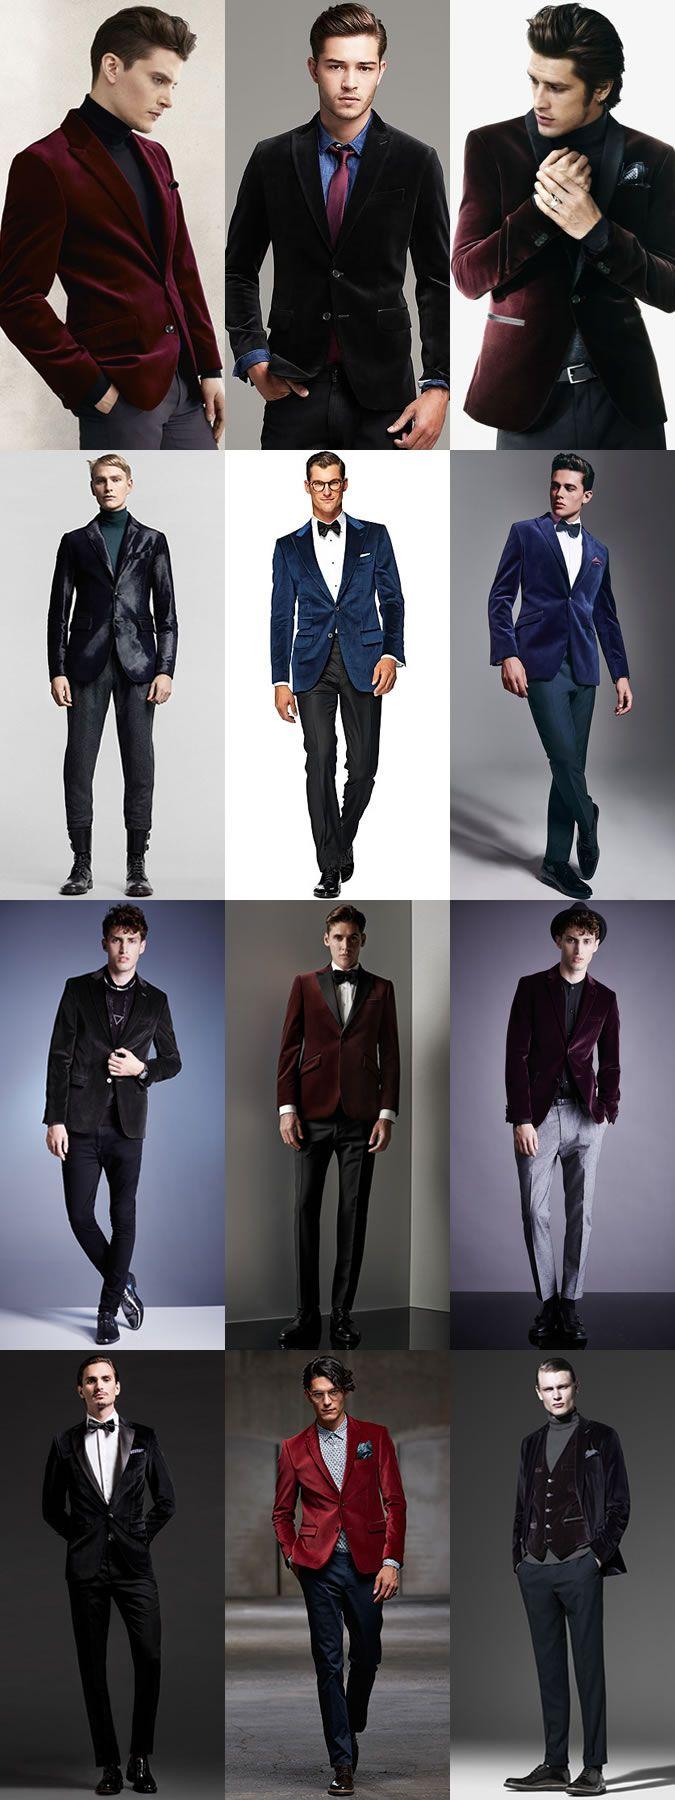 //Men's Velvet Blazer Outfit Inspiration Lookbook #fashion #menswear http://www.99wtf.net/men/mens-fasion/latest-mens-casual-trouser-trend-2016/